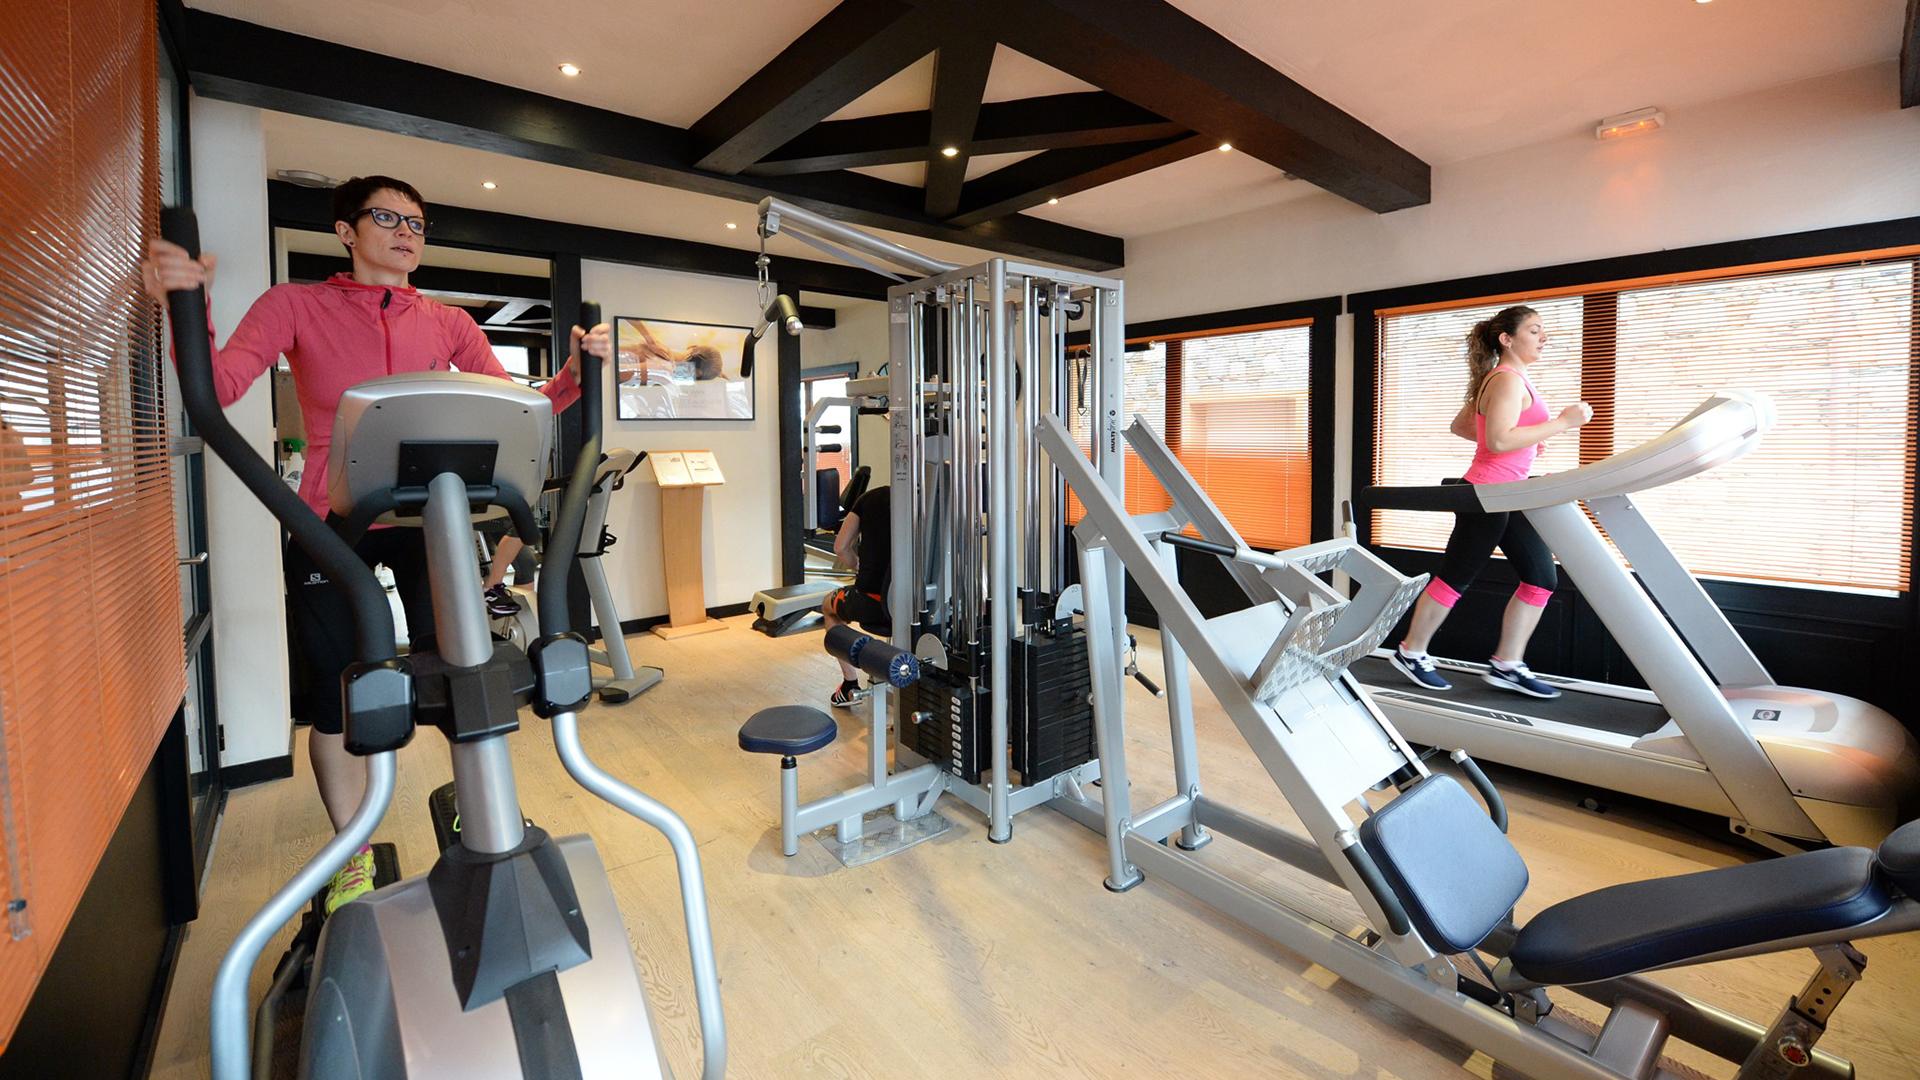 Salle Cardio-Training, Le Cœur d